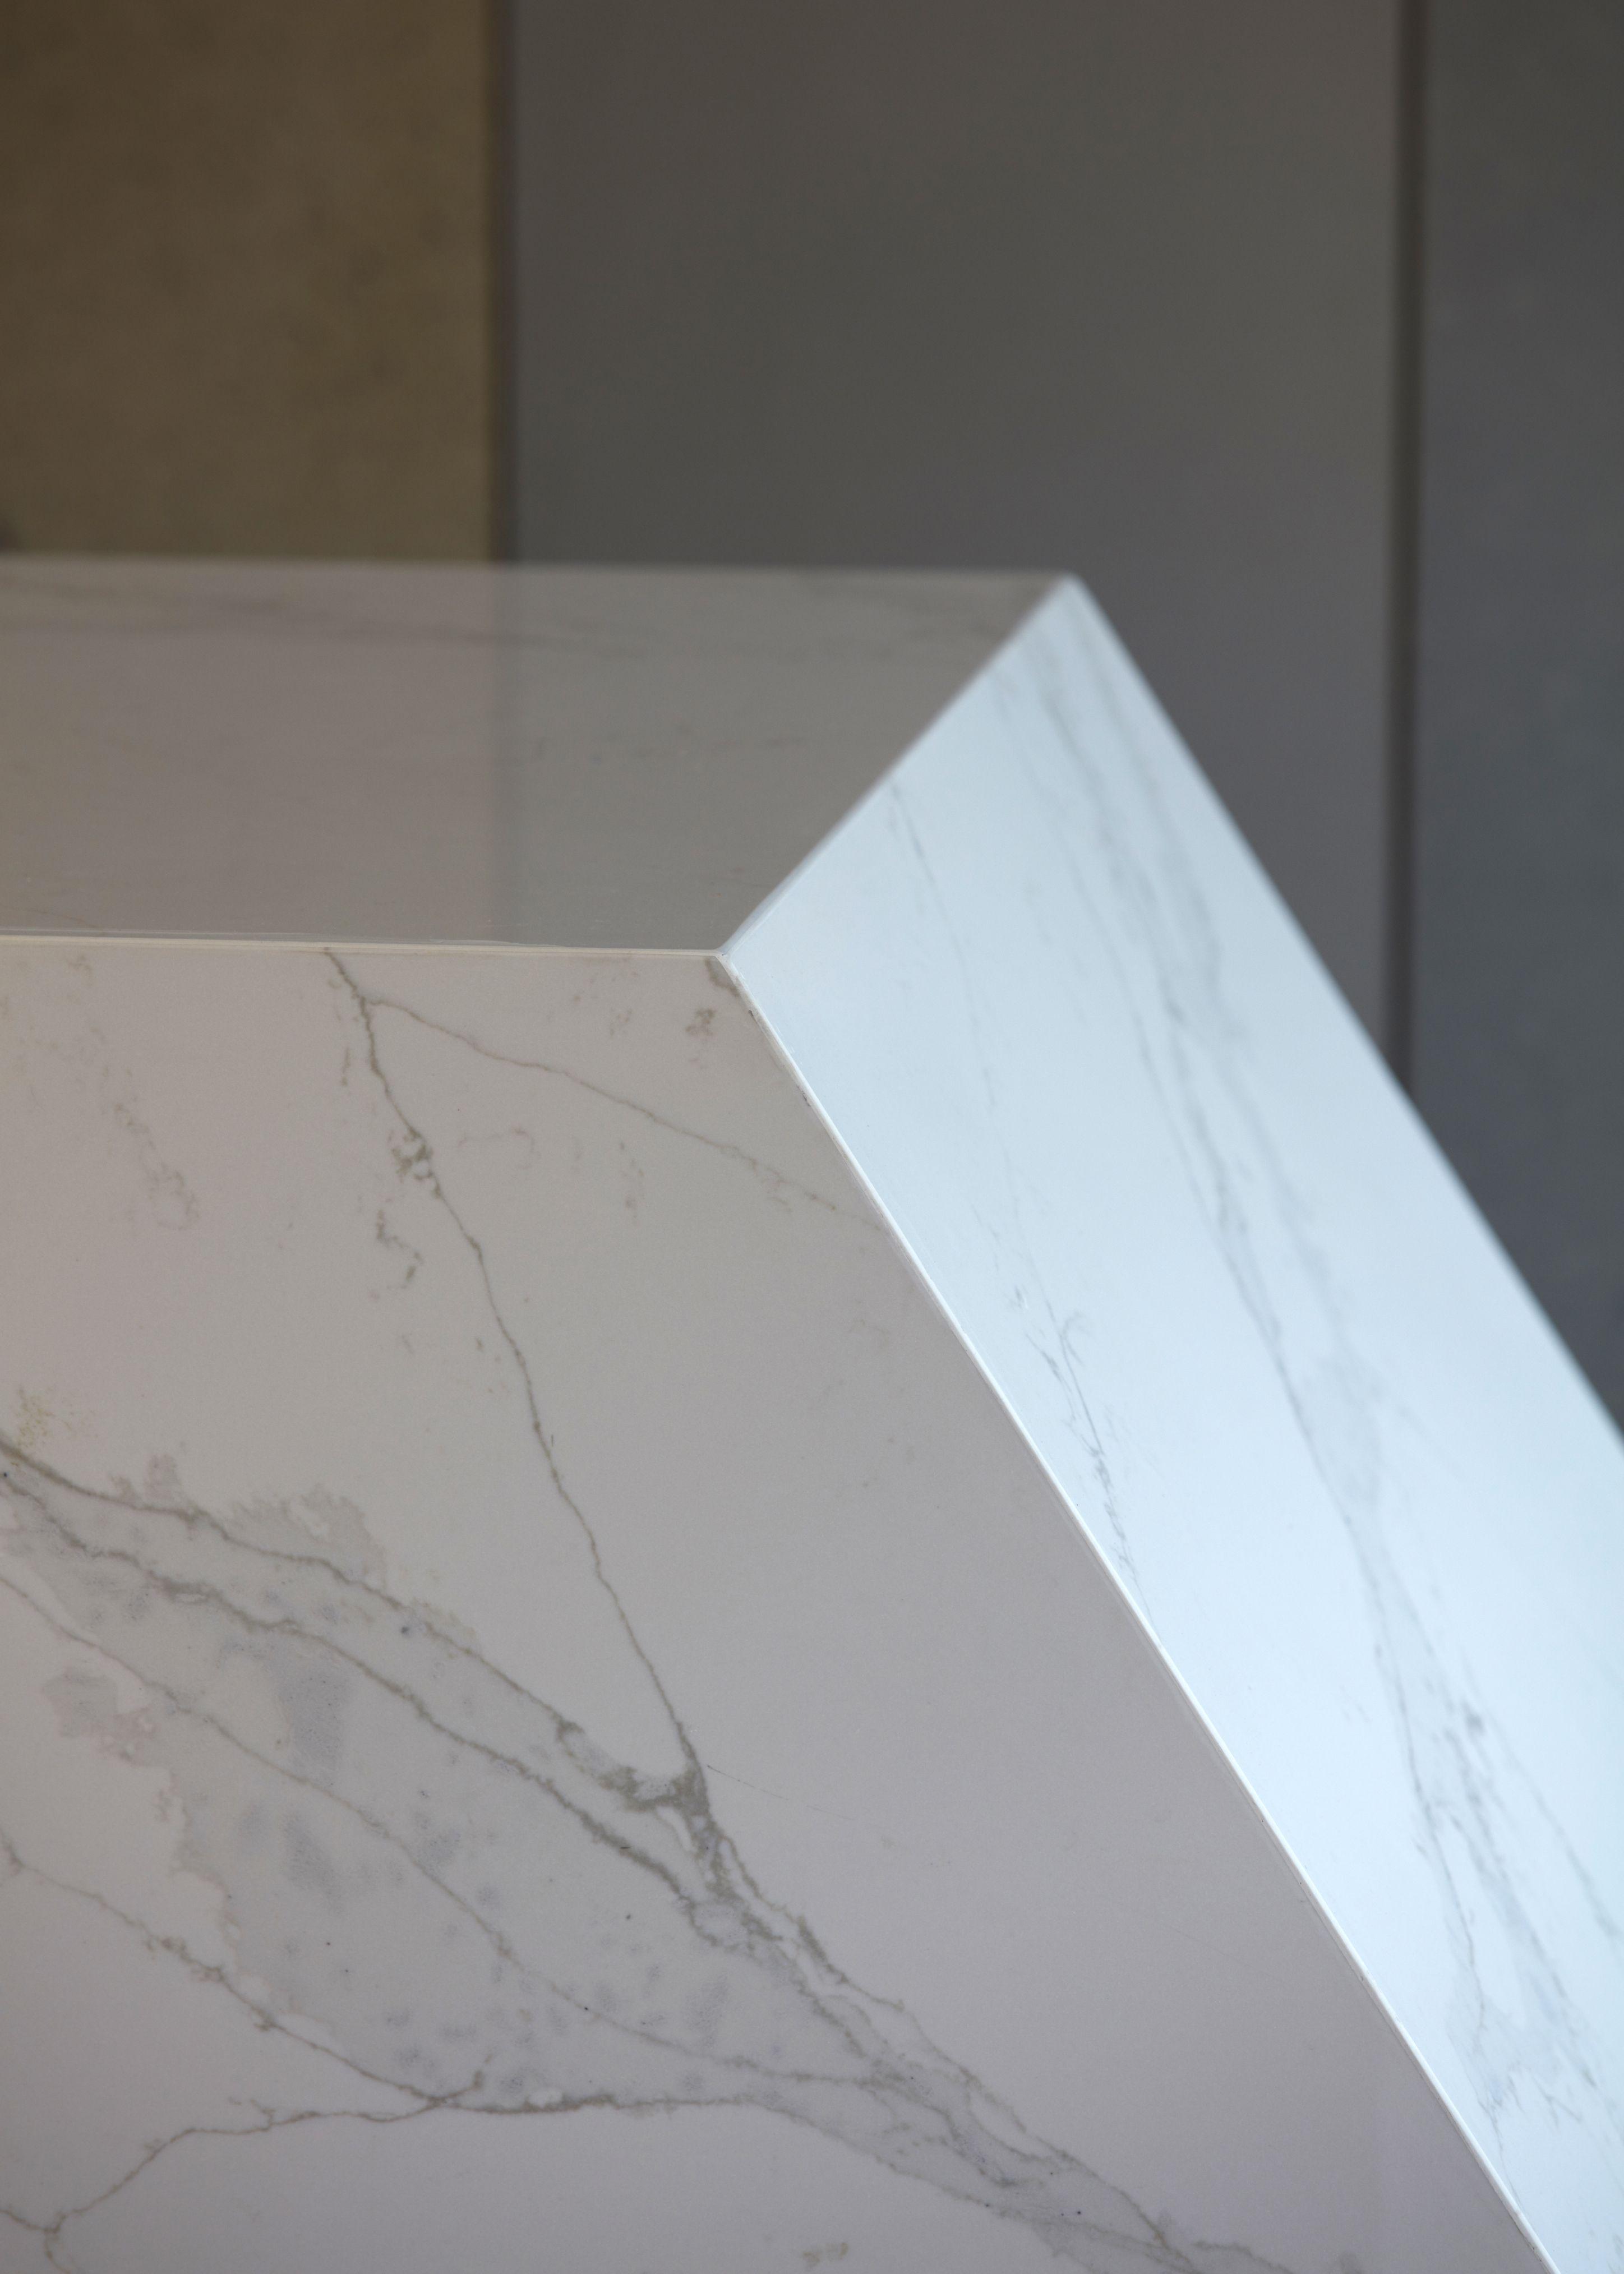 Essastone Unique Calacatta Engineered Stone With The Stunning Look Of Real Marble Engineered Stone Calacatta Stone Slab